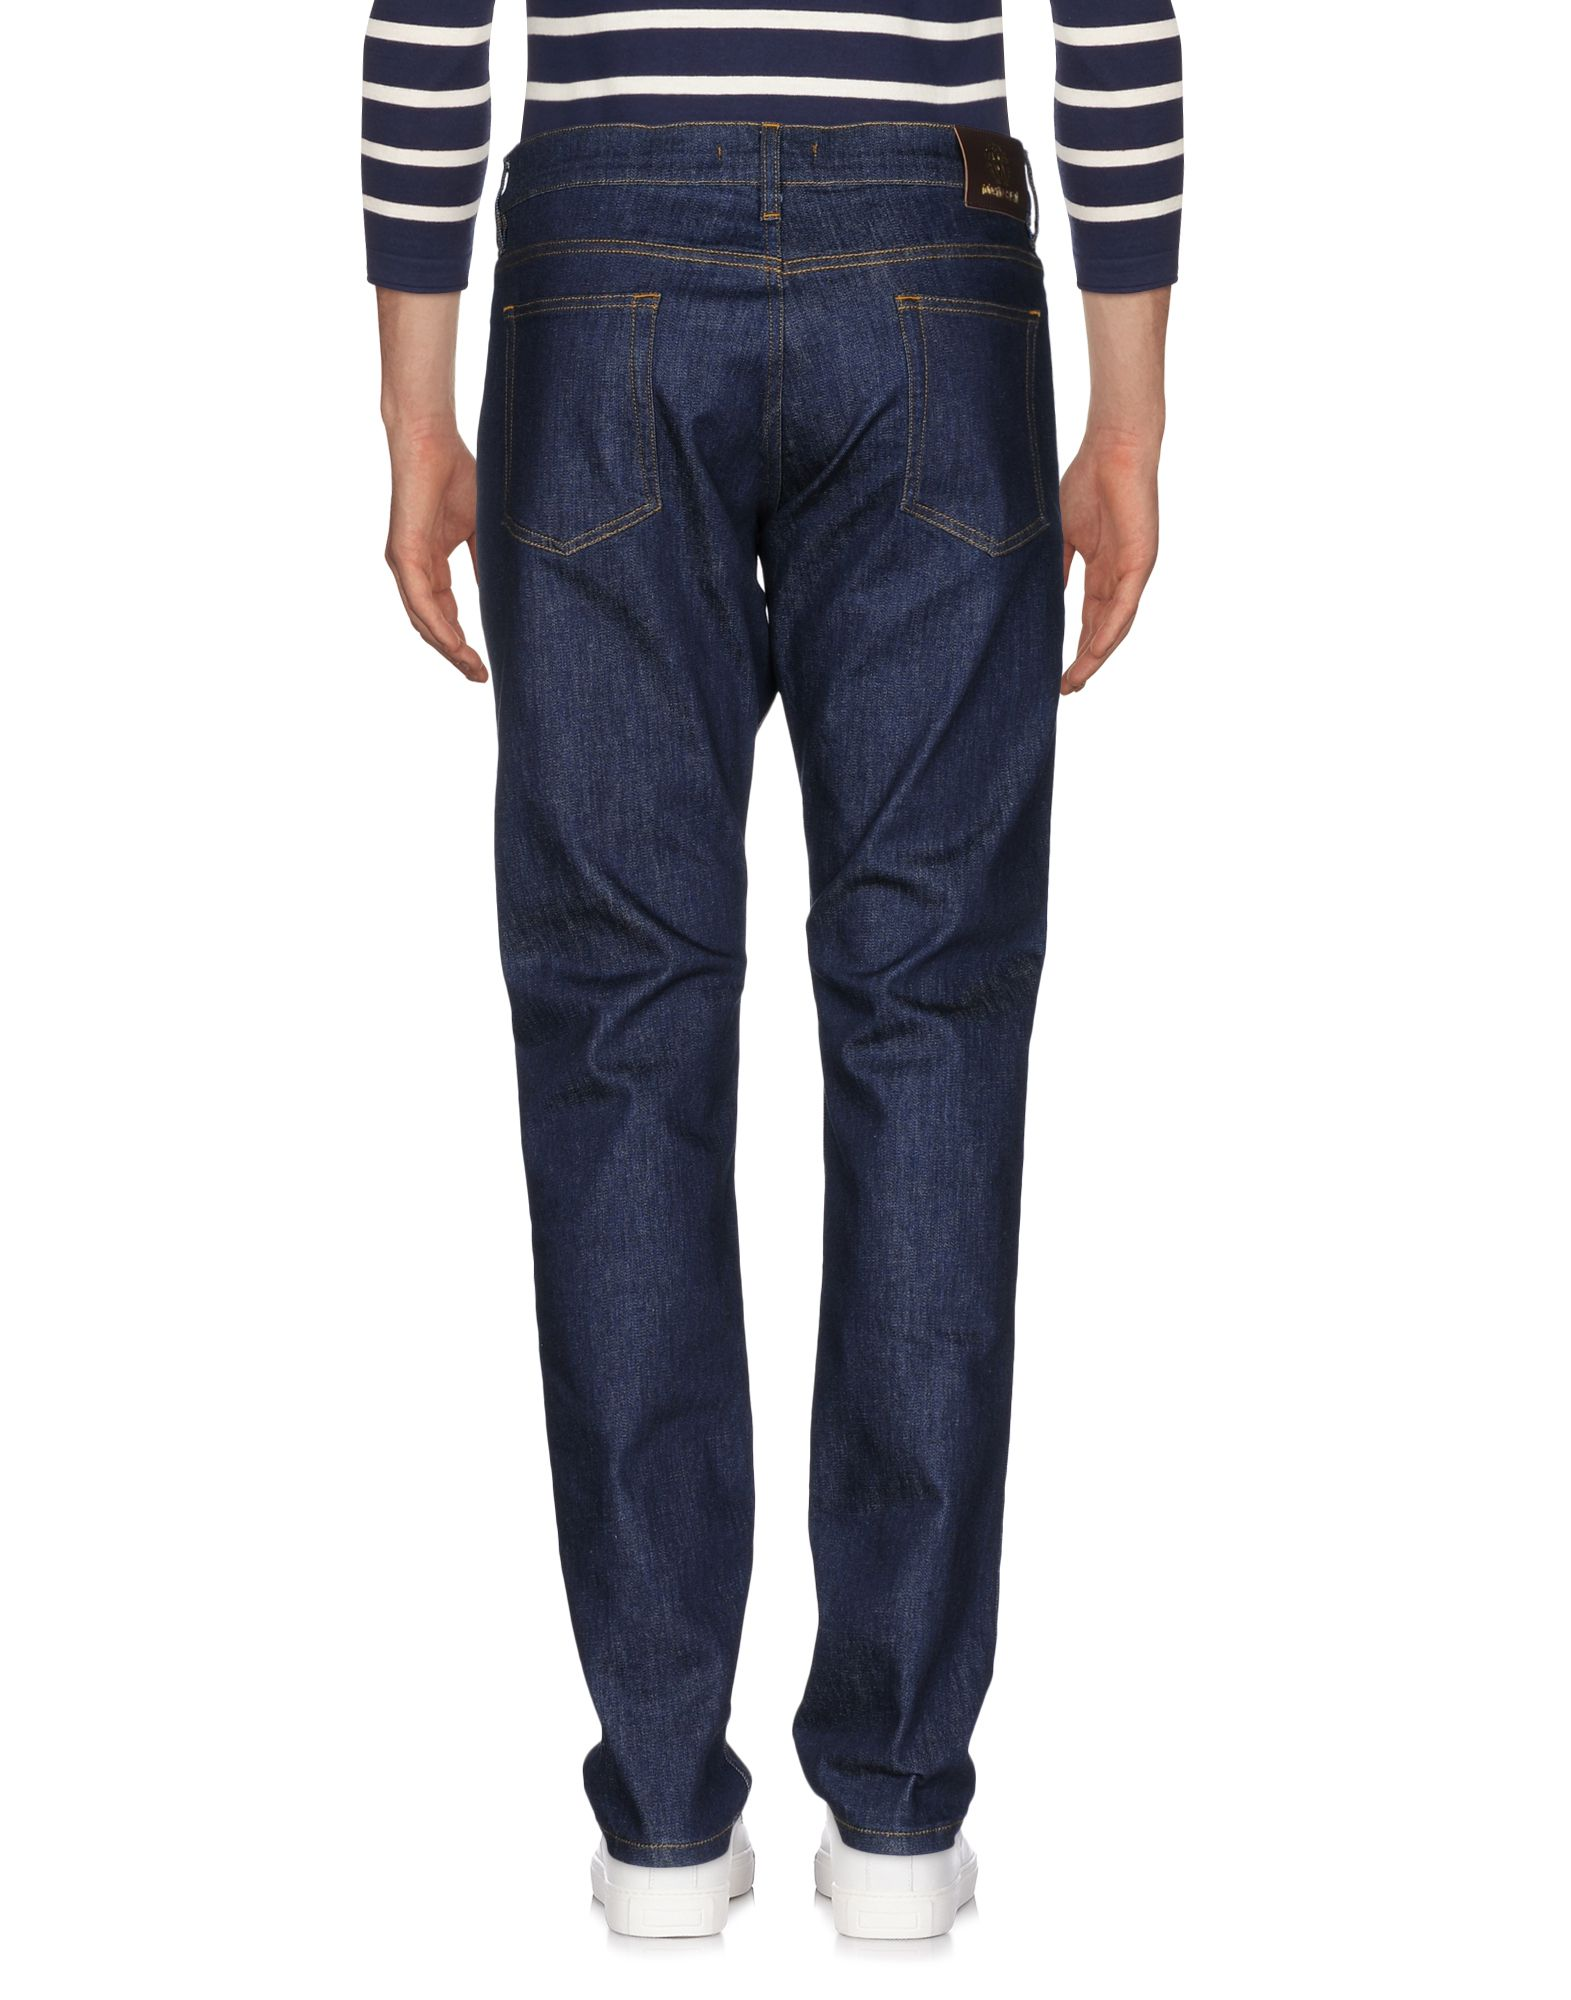 Pantaloni Jeans Roberto Cavalli Uomo - 42641580HD 42641580HD 42641580HD 6b62e9